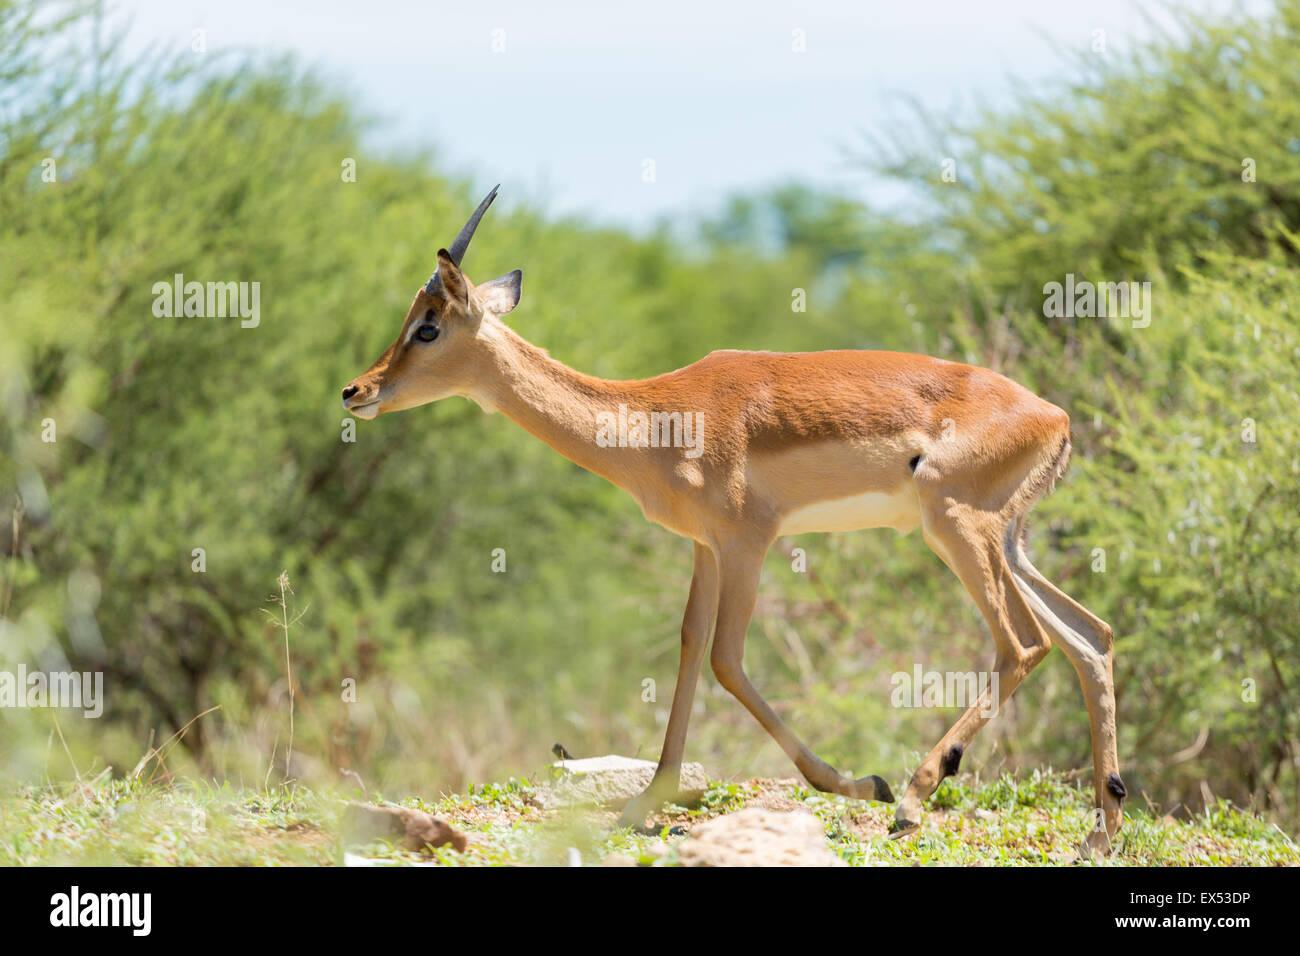 Impala at the Mokolodi Nature Reserve in Botswana - Stock Image